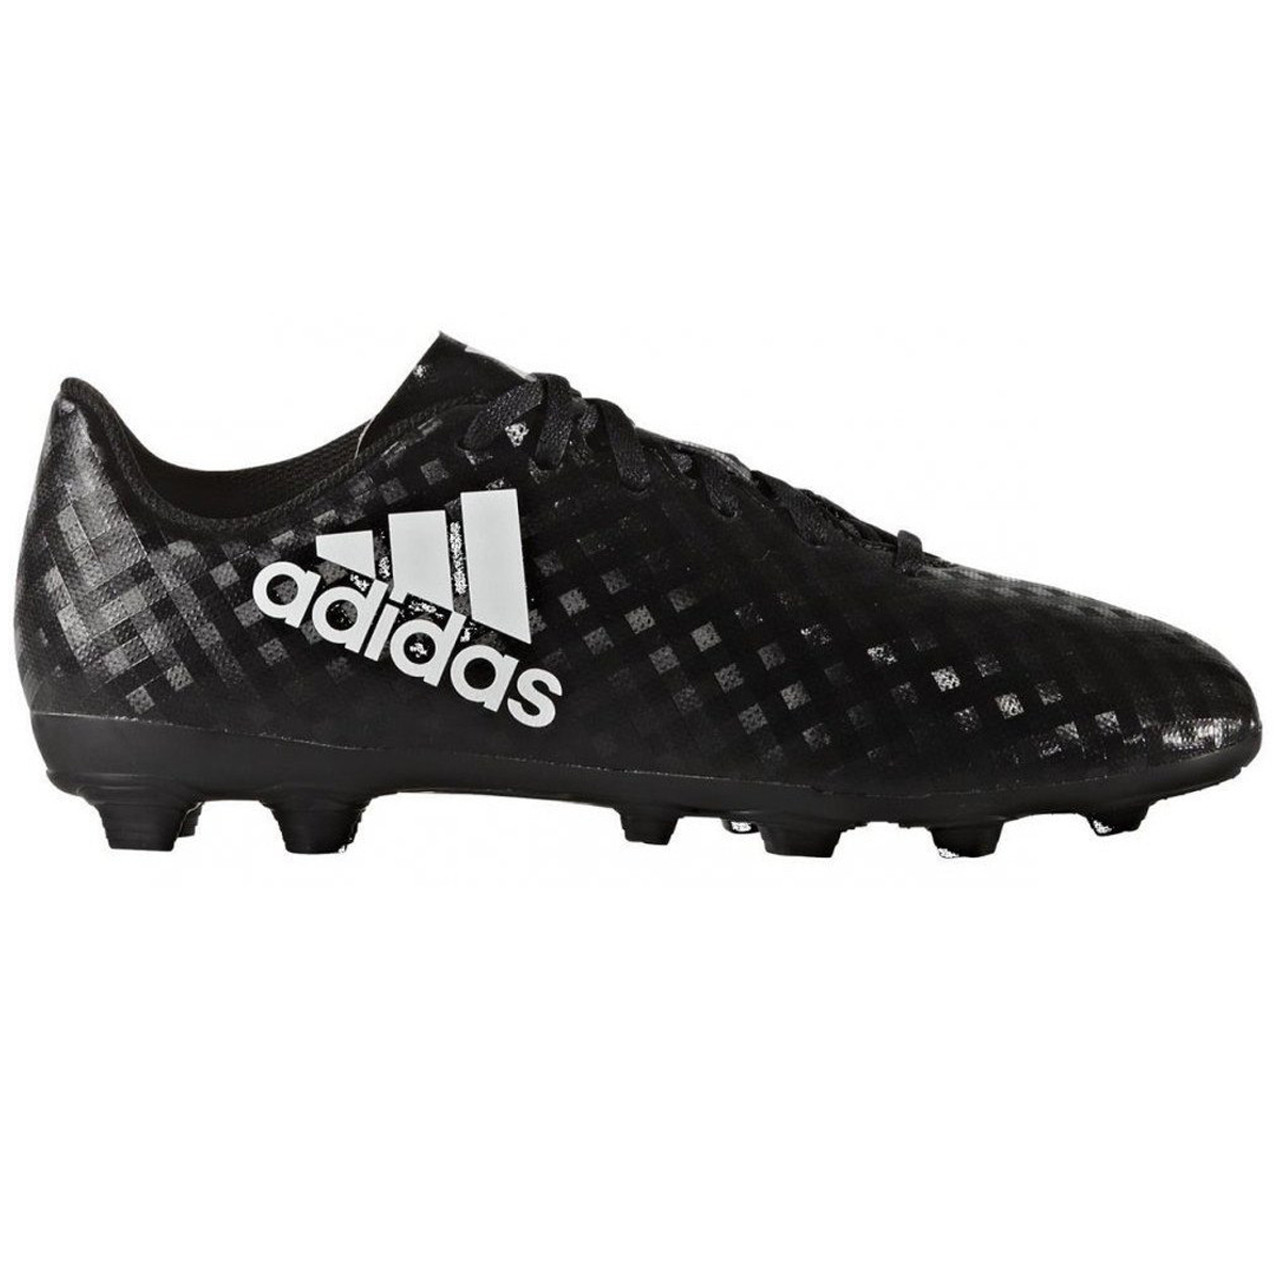 hot sale online 9bdee 9cd6a Adidas X 16.4 FxG Junior Soccer Cleats BB1045 - Black, White